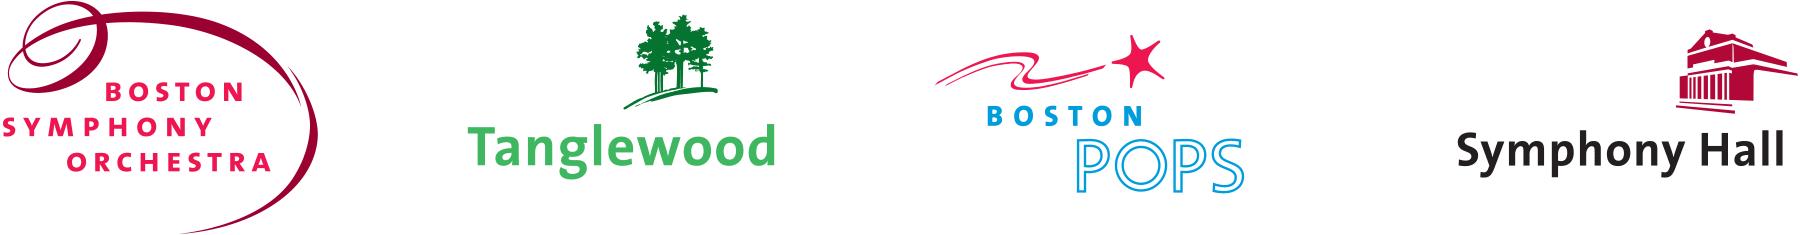 Boston Symphony Orchestra logos